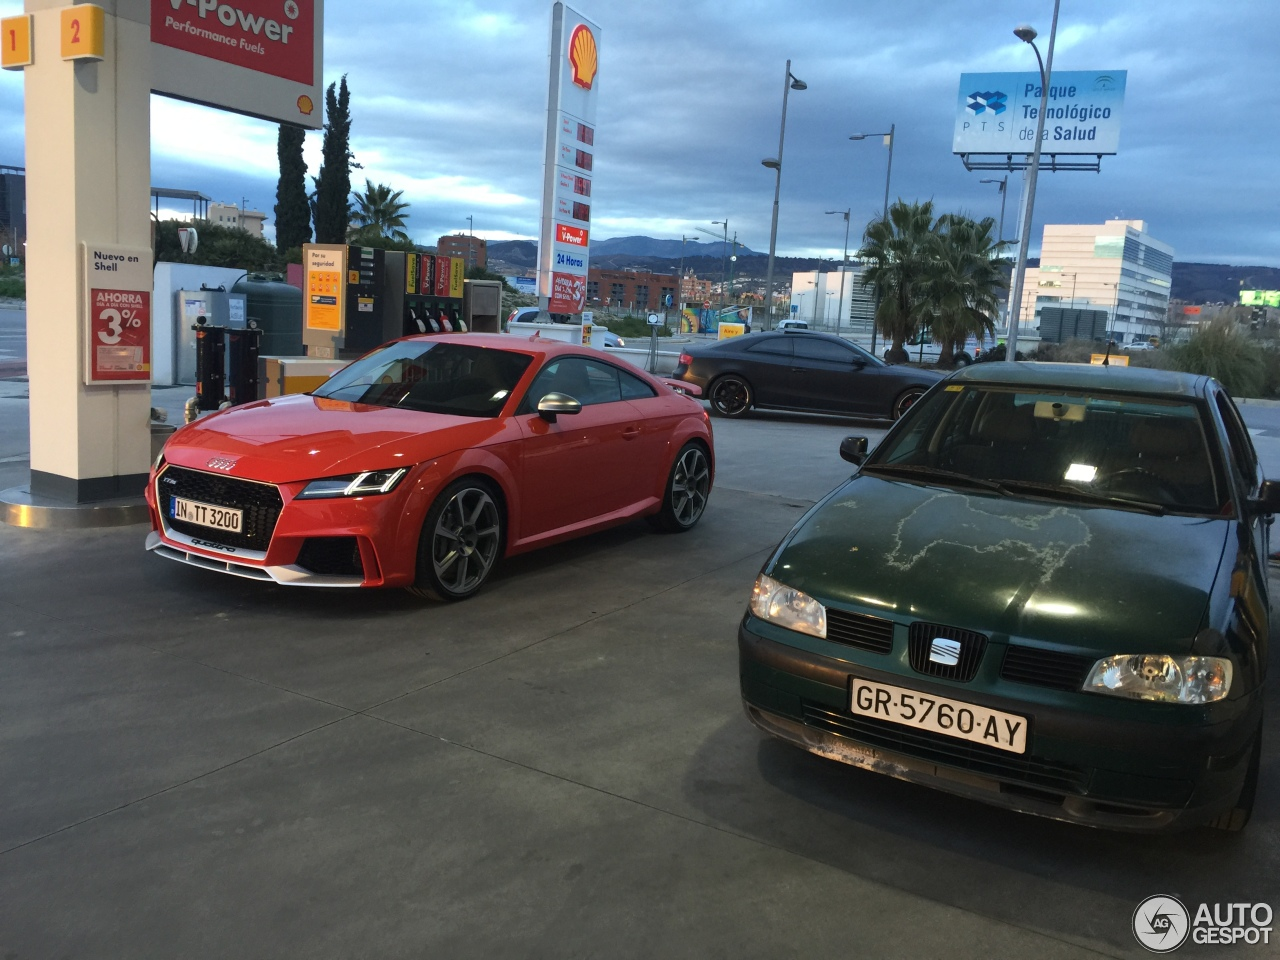 Audi TT-RS 2017 - 11 March 2016 - Autogespot